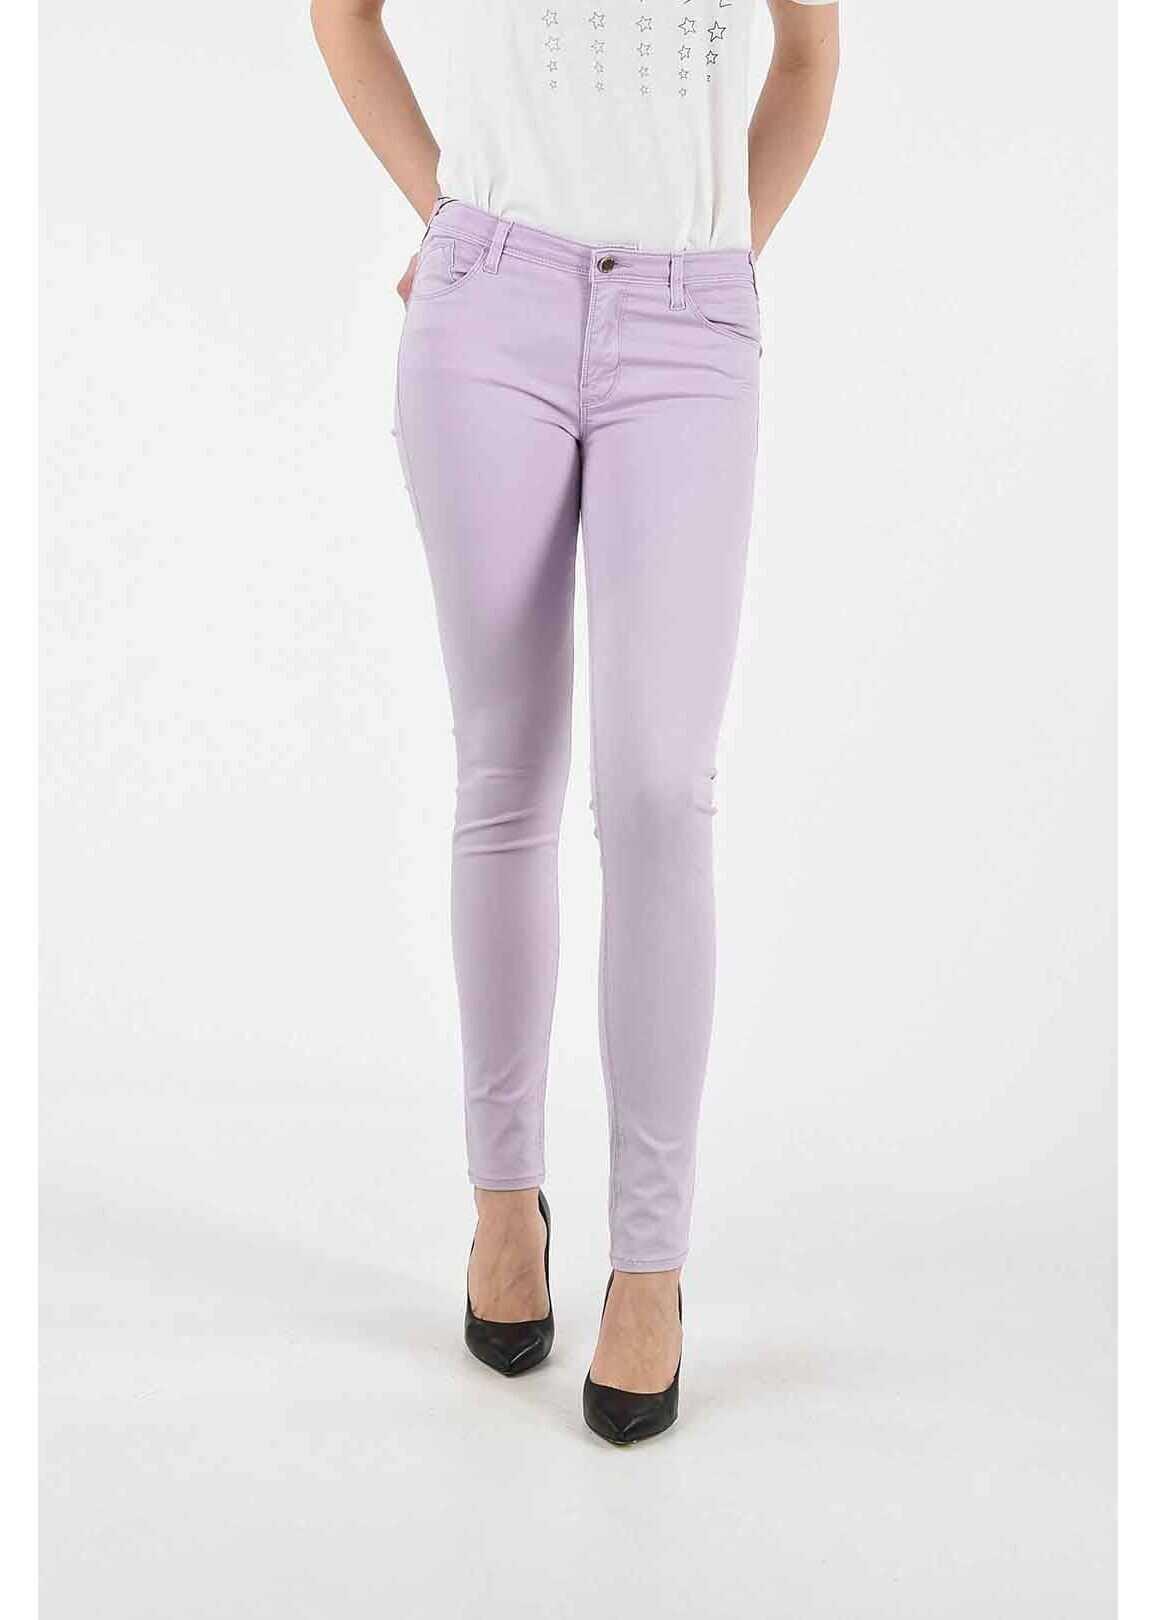 Armani ARMANI JEANS Skinny Fit ORCHID Jeans VIOLET